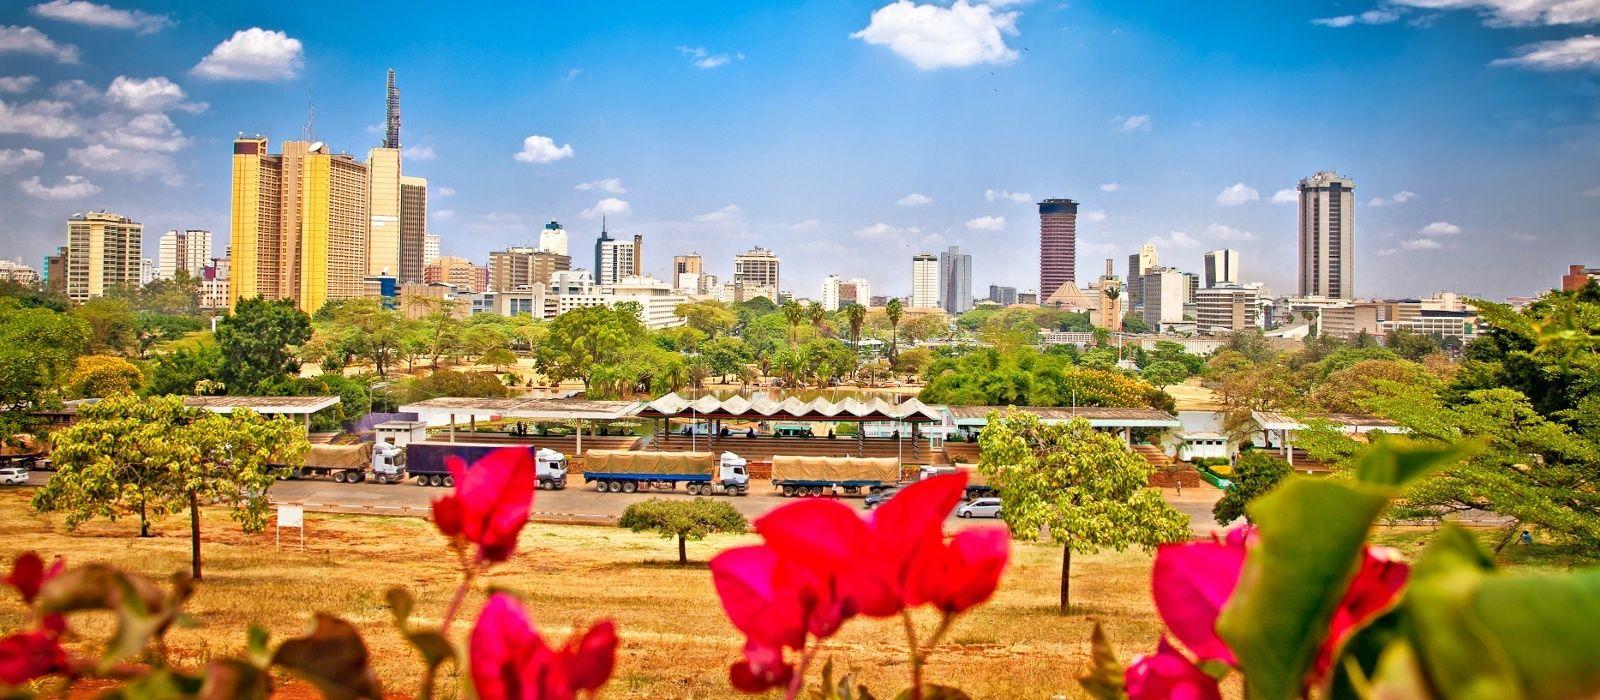 Kenia und Tansania: Kamel Trekking und Strandurlaub Urlaub 5